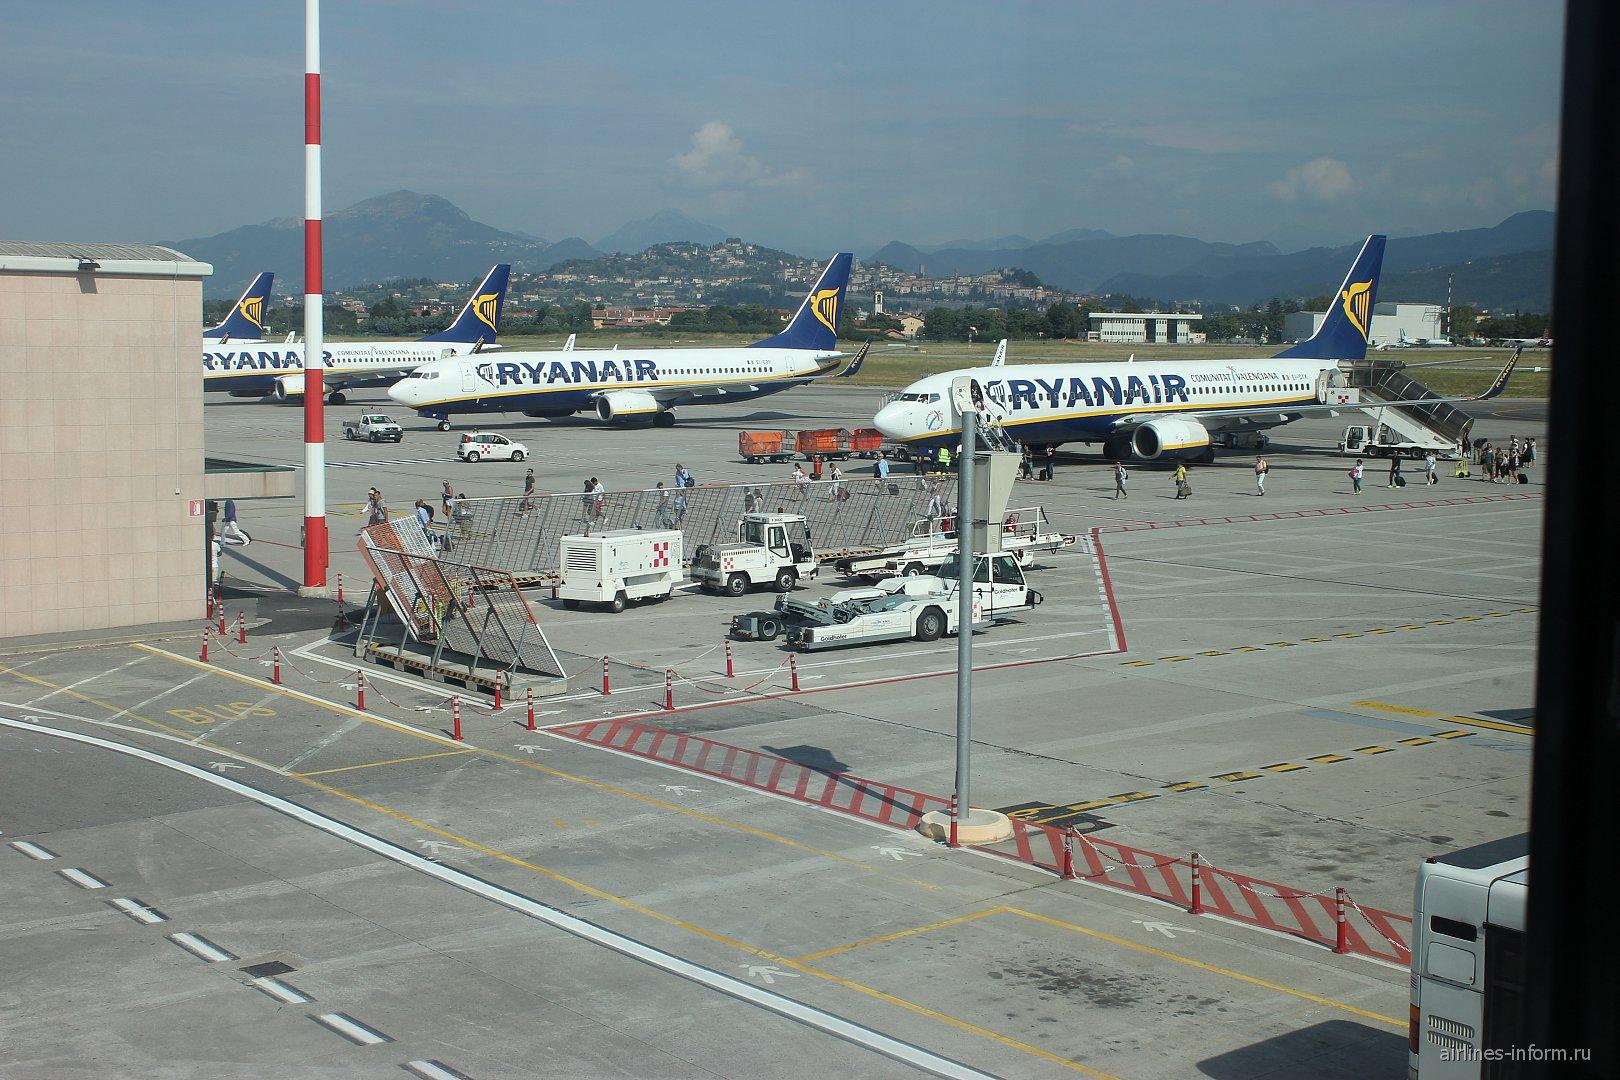 Самолеты Ryanair на перроне аэропорта Милан Бергамо